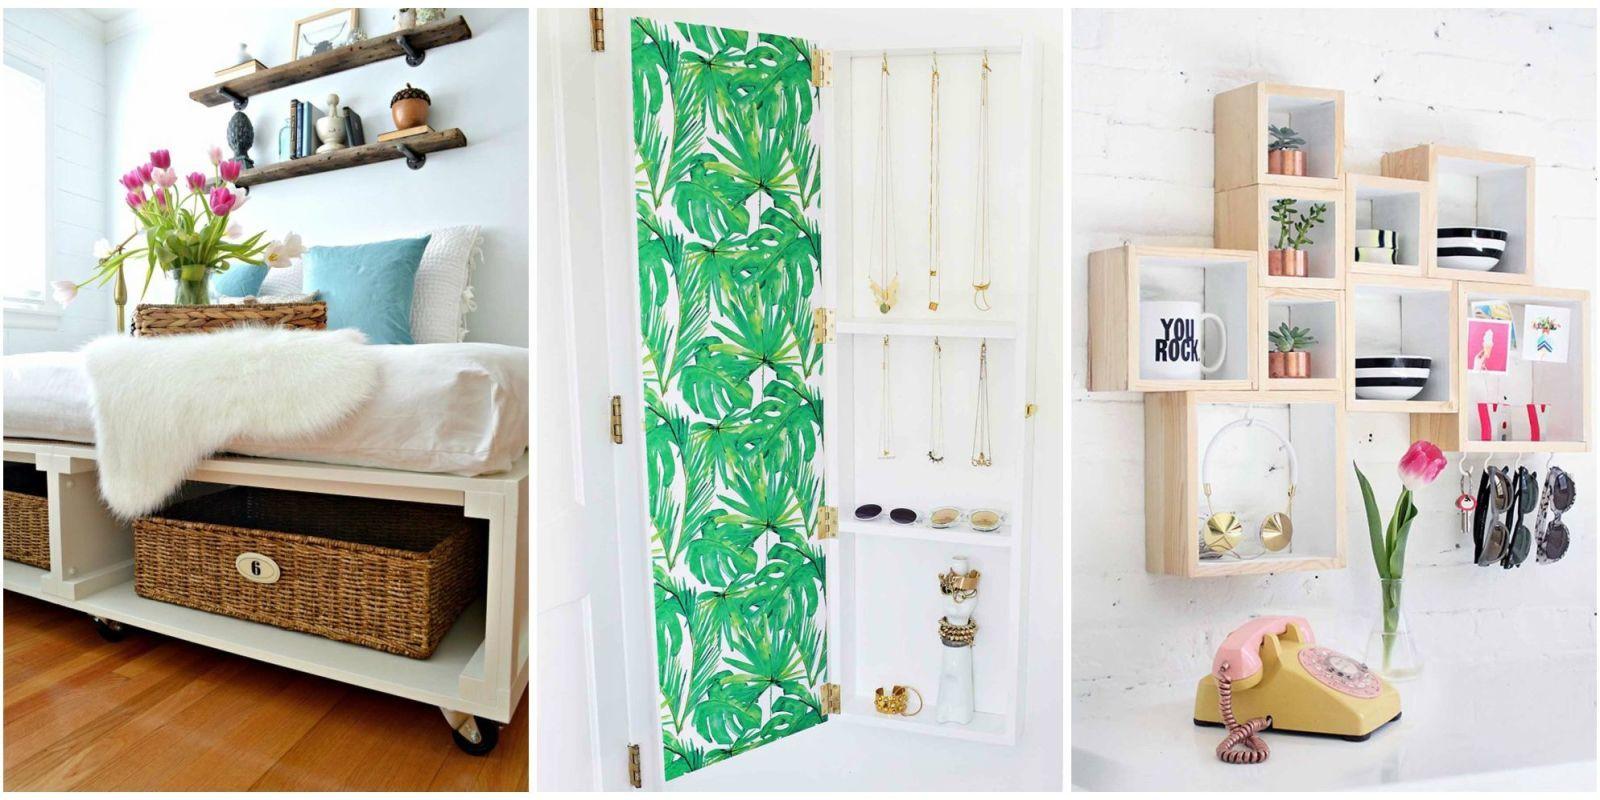 Organize Your Bedroom - Best Home Interior •